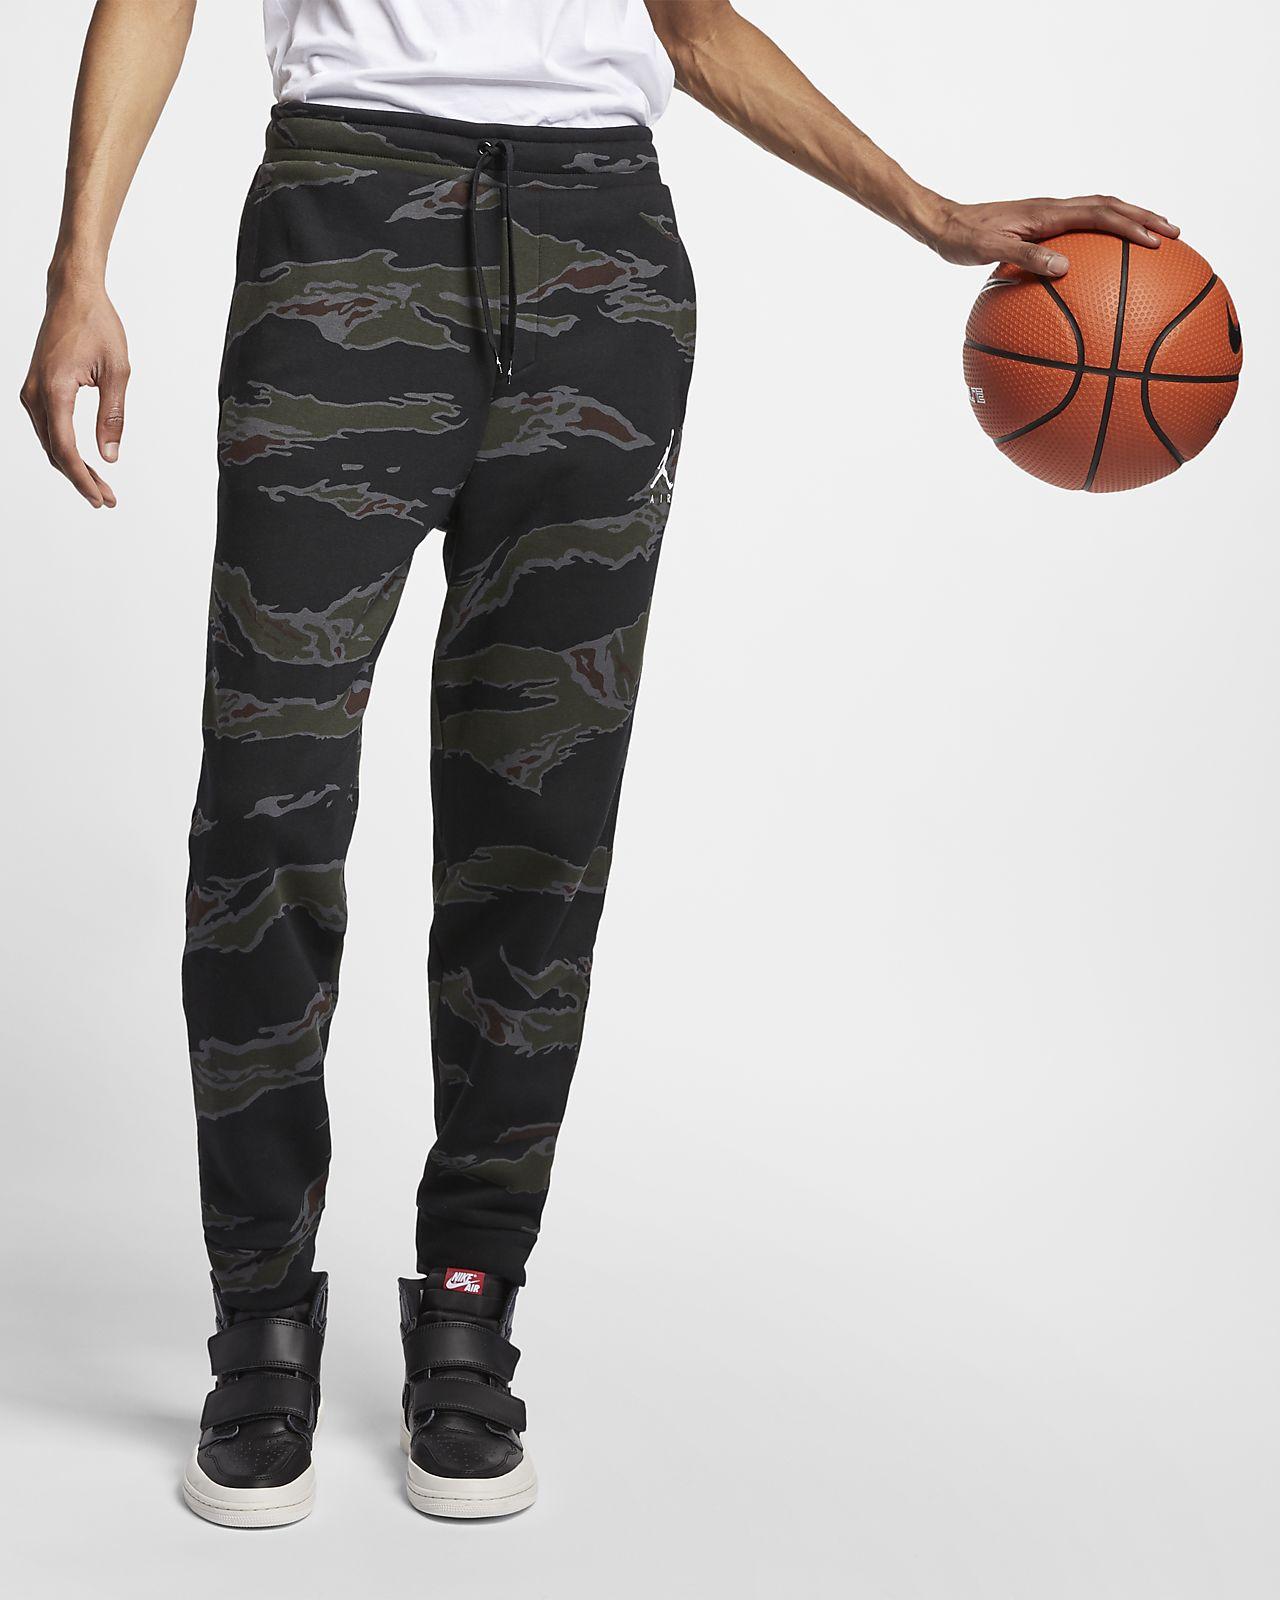 cd5c33164872 Jordan Jumpman Men s Camo Fleece Trousers. Nike.com BG